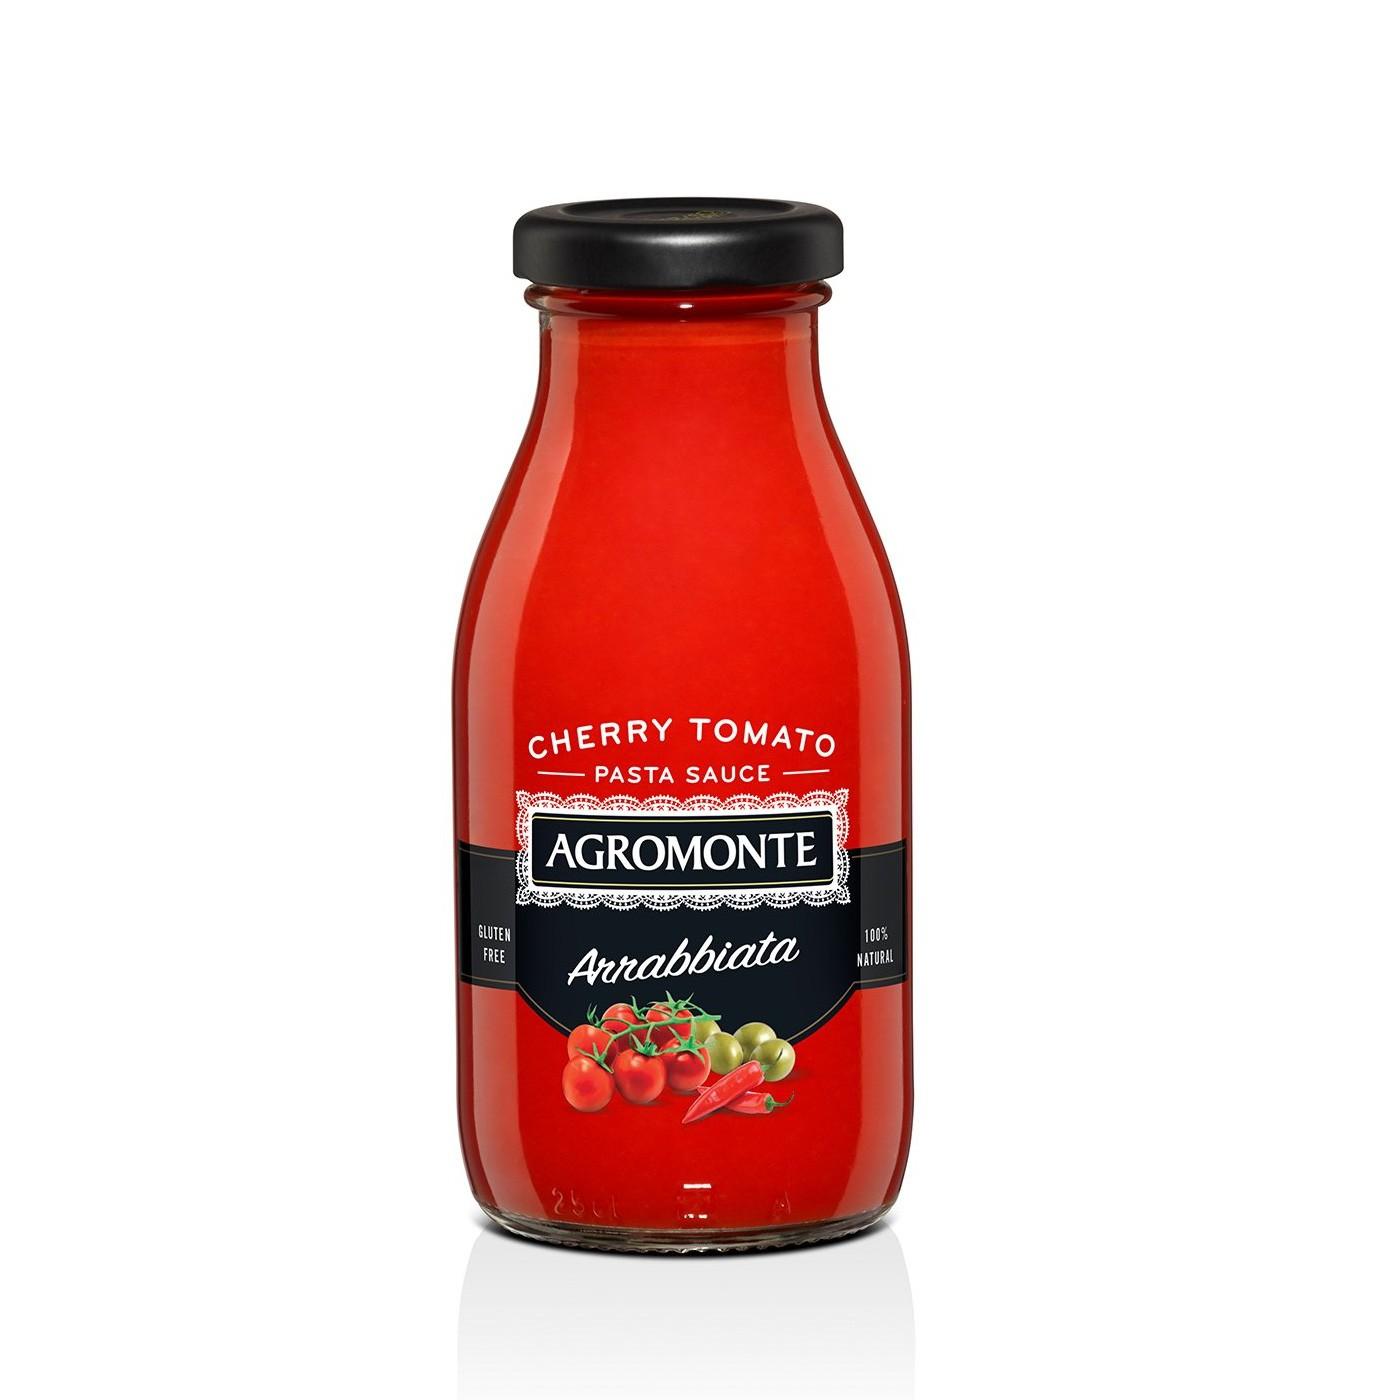 Cherry Tomato Arrabbiata Sauce 9 oz